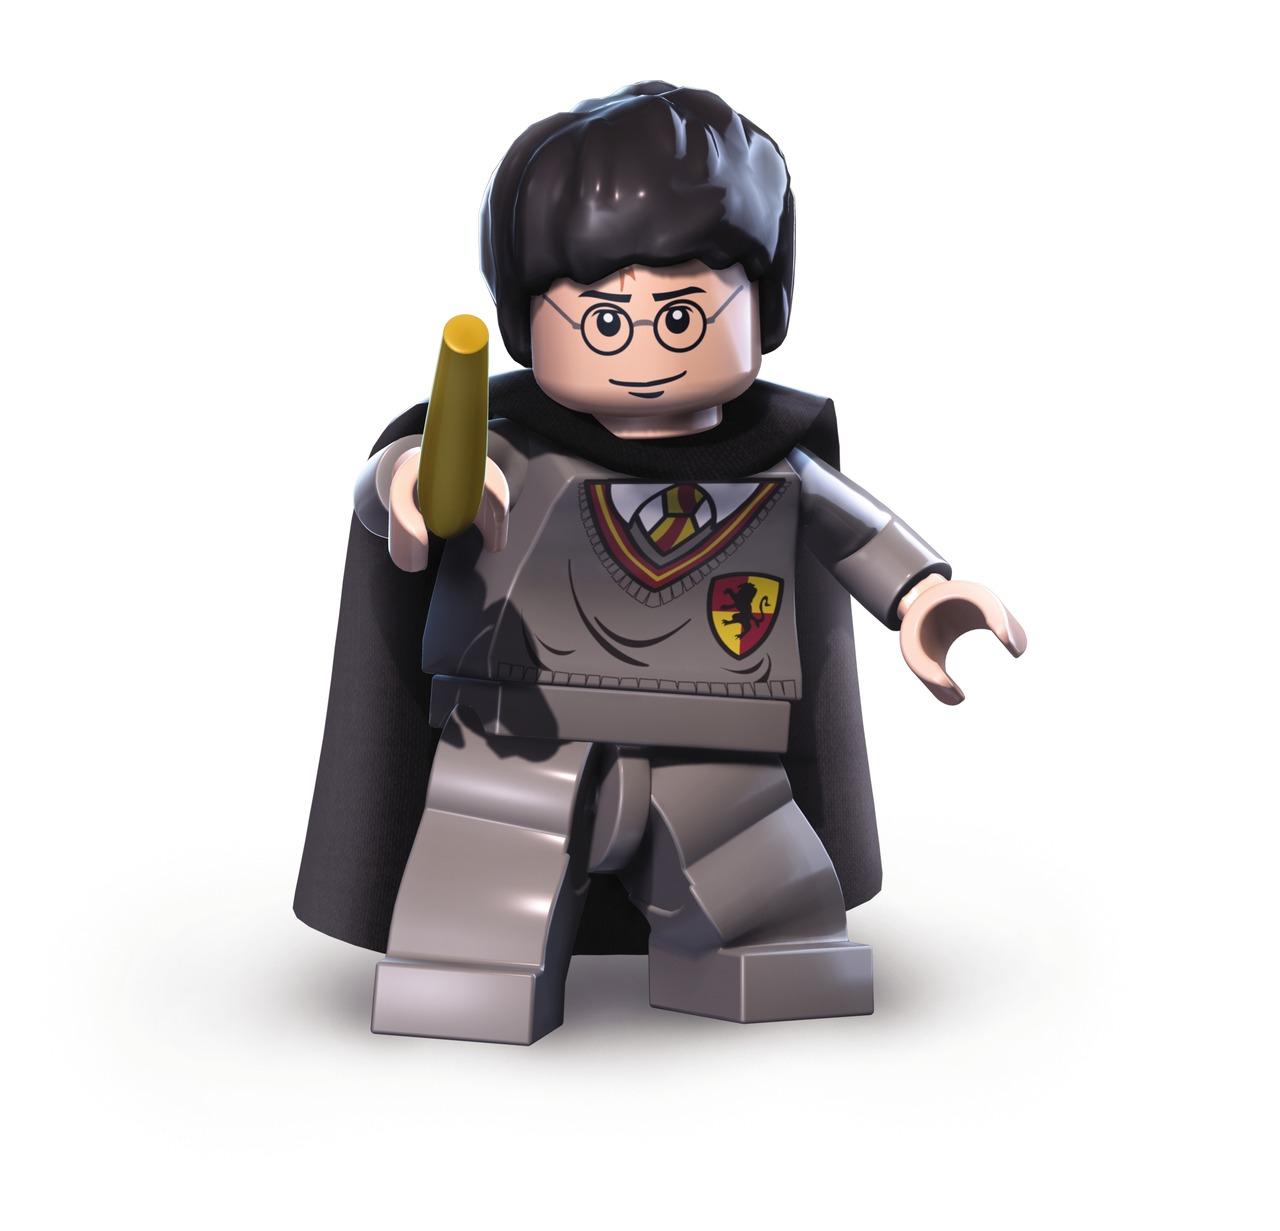 Harry Potter Lego Harry Potter Wiki Fandom